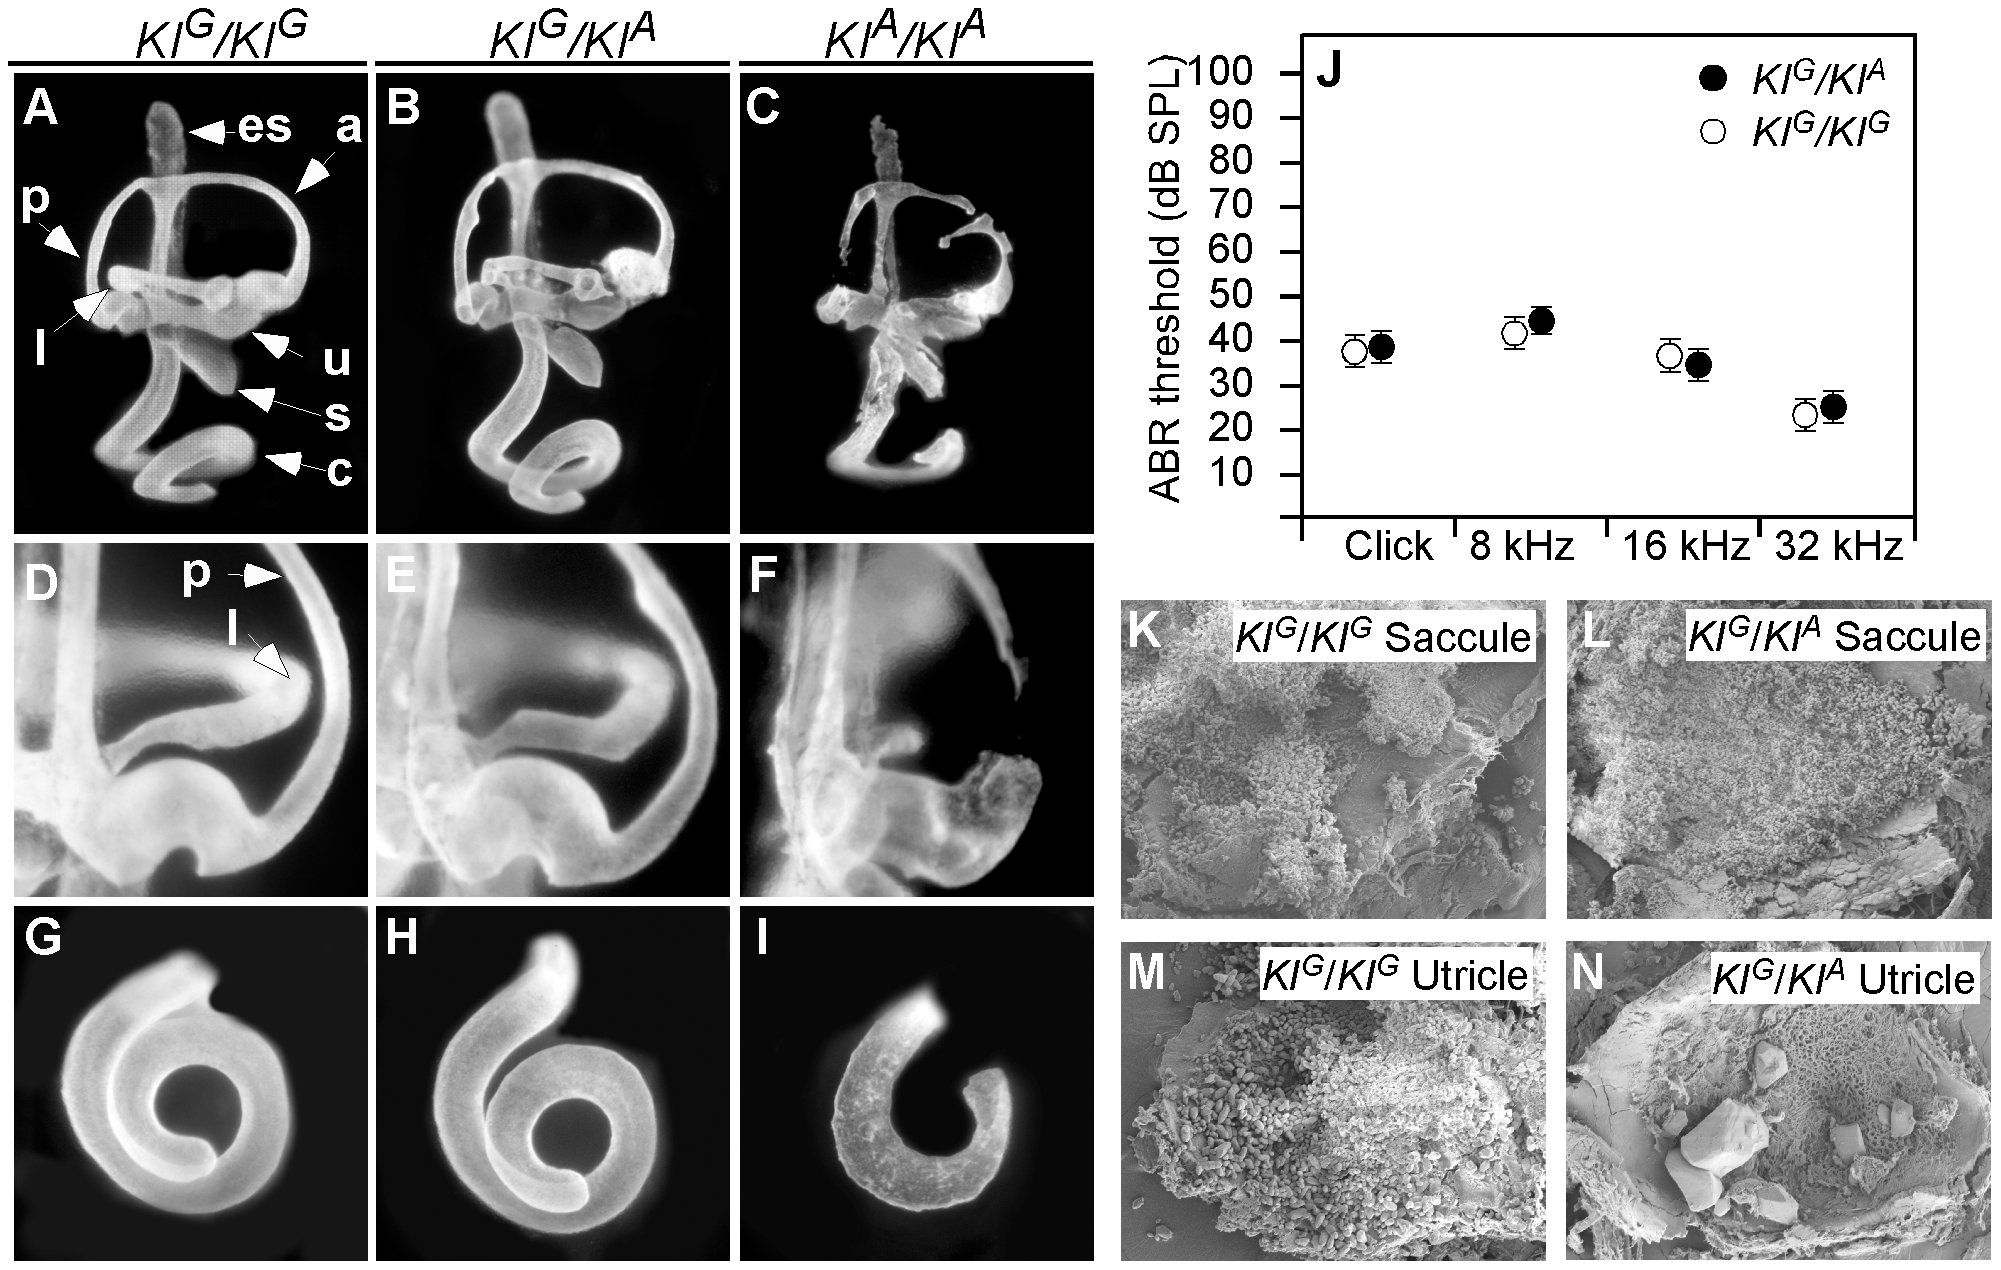 Inner ear morphology, hearing thresholds, and otoconia of wild-type (<i>KI<sup>G</sup></i>) and <i>Tw</i> (<i>KI<sup>A</sup></i>) knockin mice.